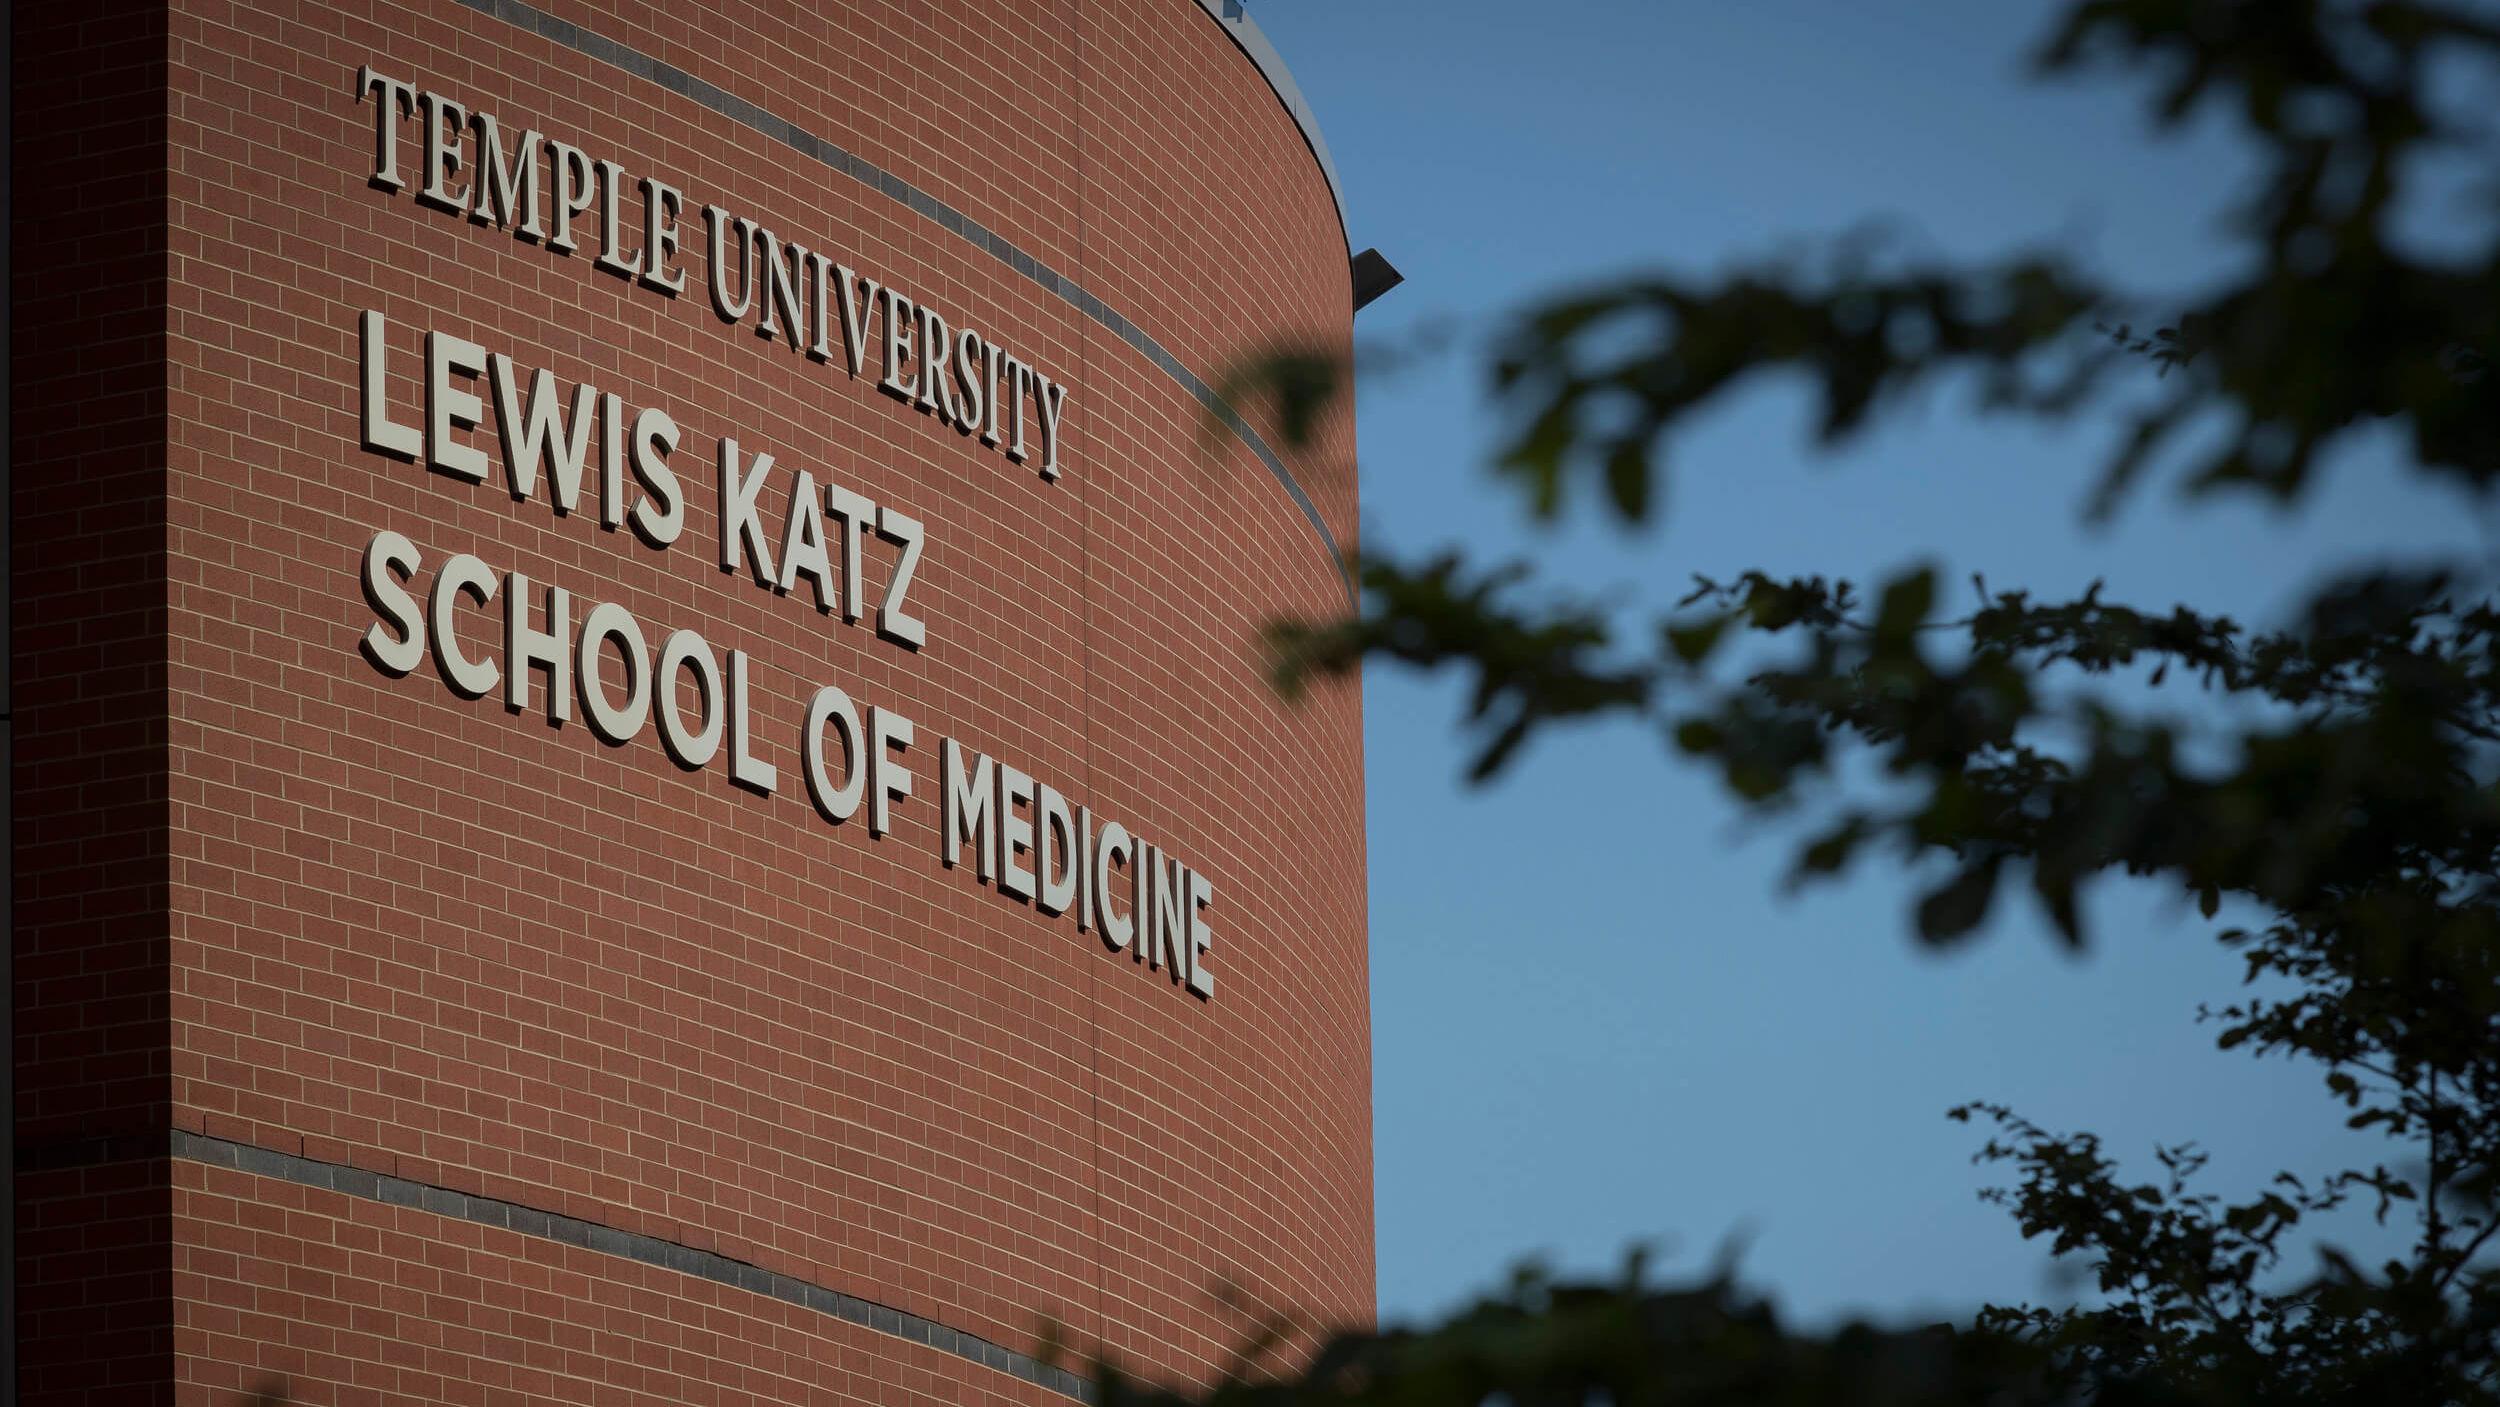 The Lewis Katz School of Medicine at Temple University.